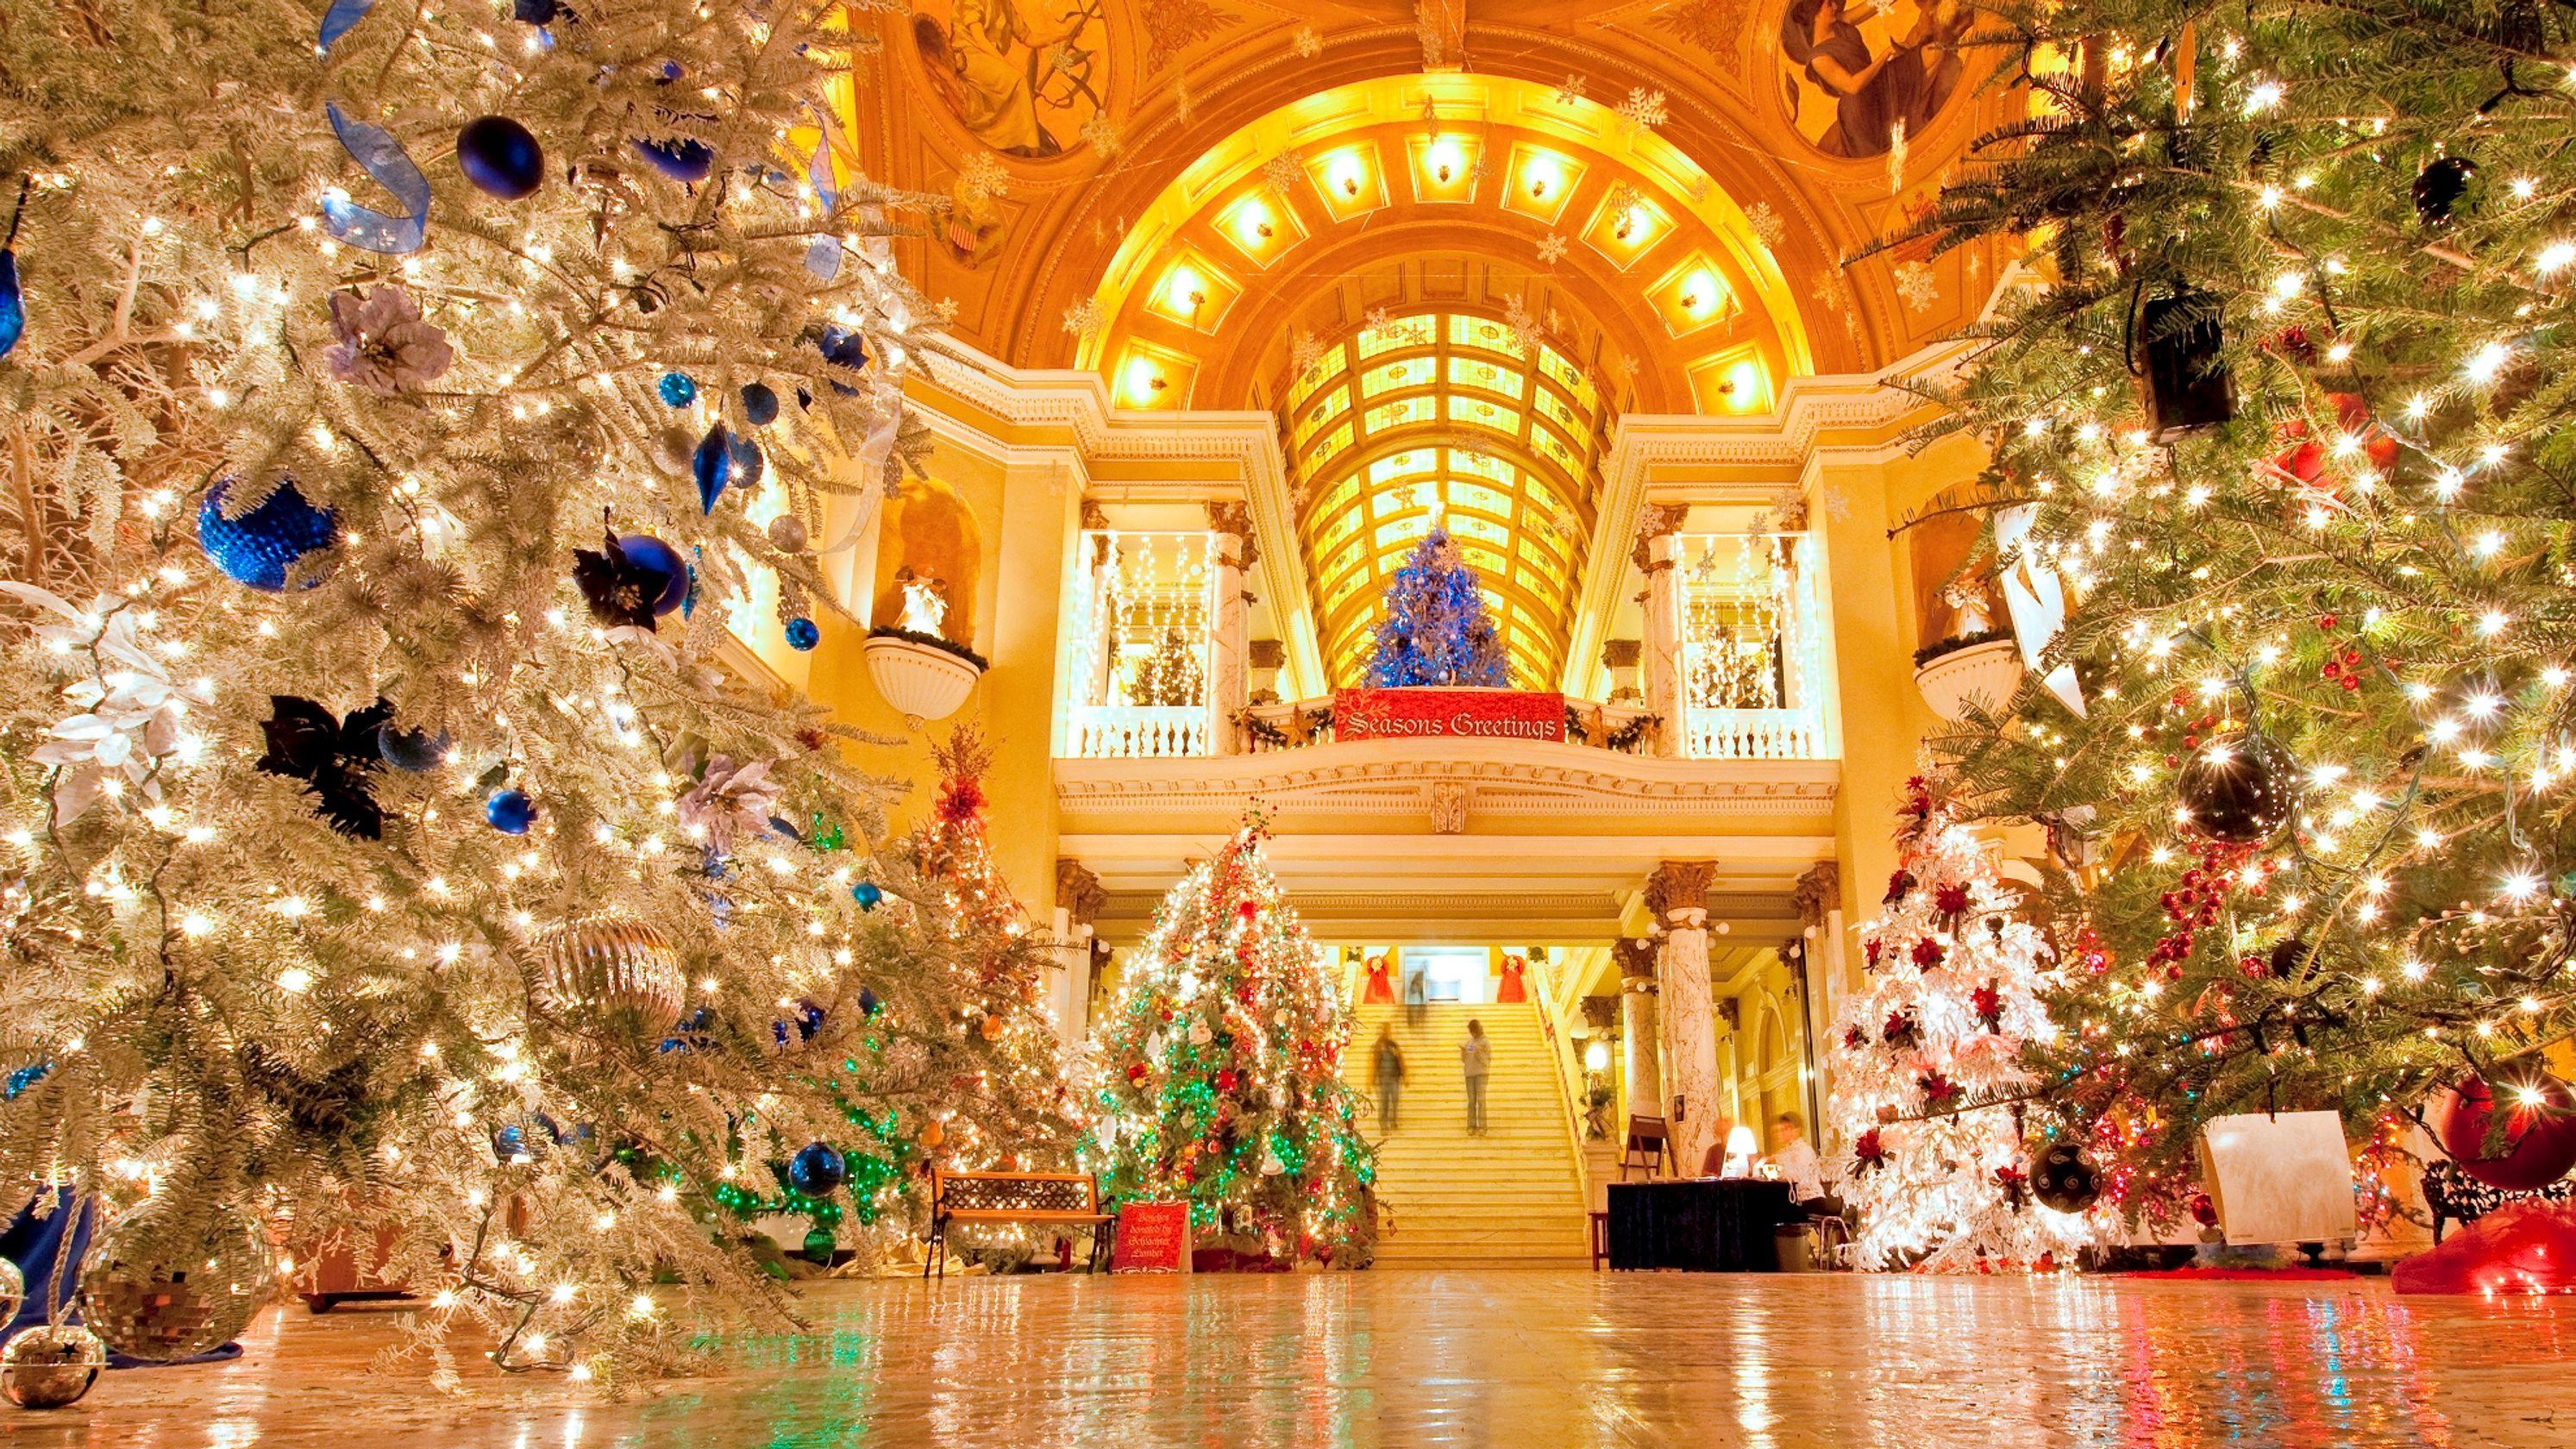 10 Travel Worthy Christmas Trees Across The Usa Large Christmas Tree Happy Christmas Day Real Christmas Tree